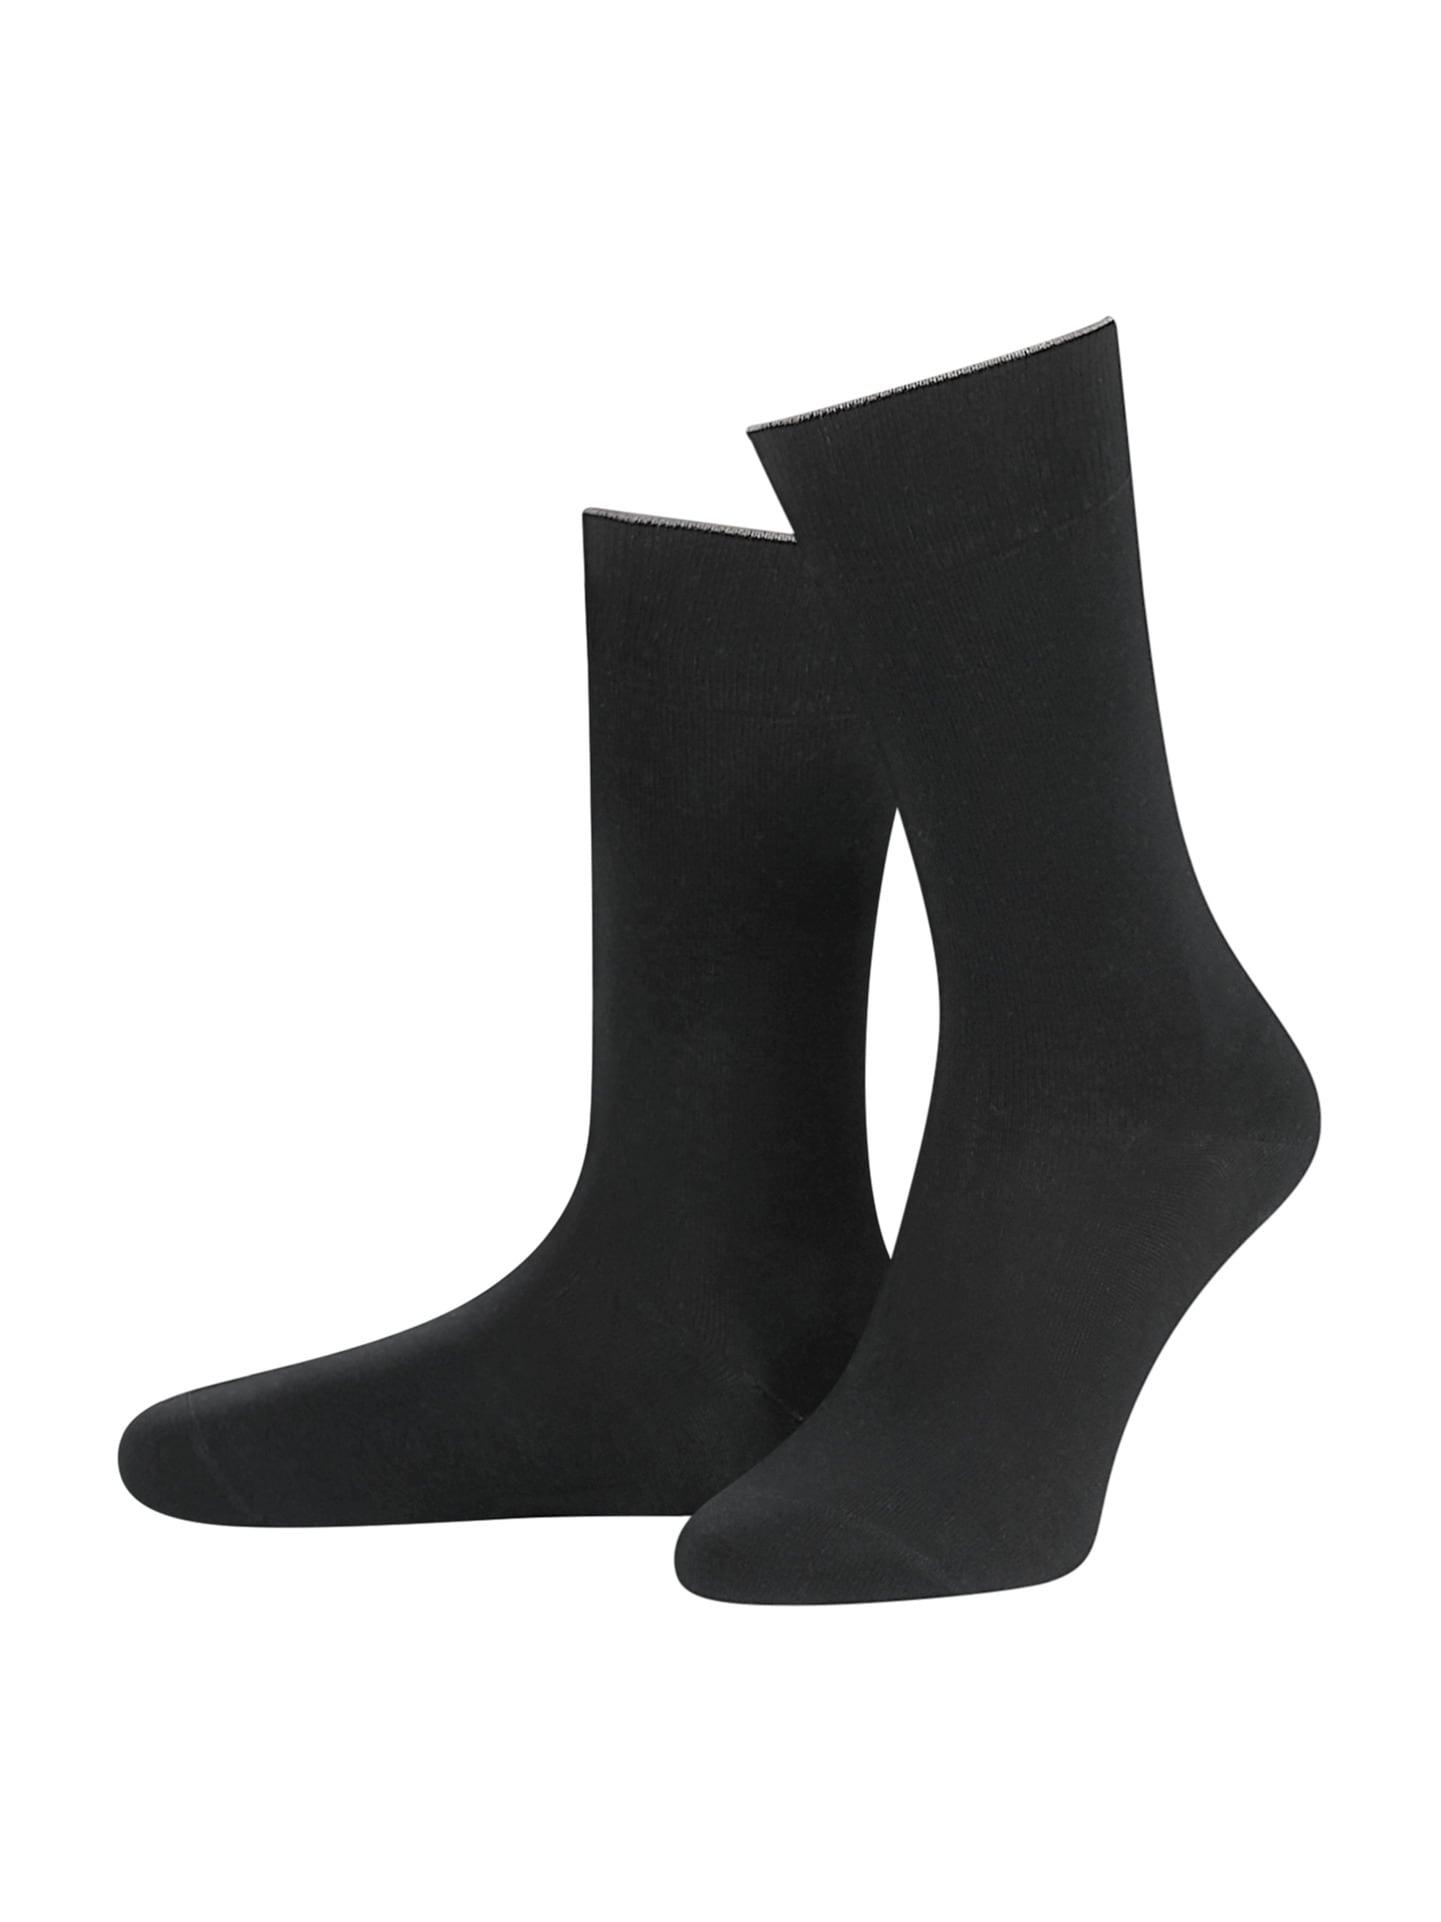 Image of Cool Max-Socke 2er-Pack